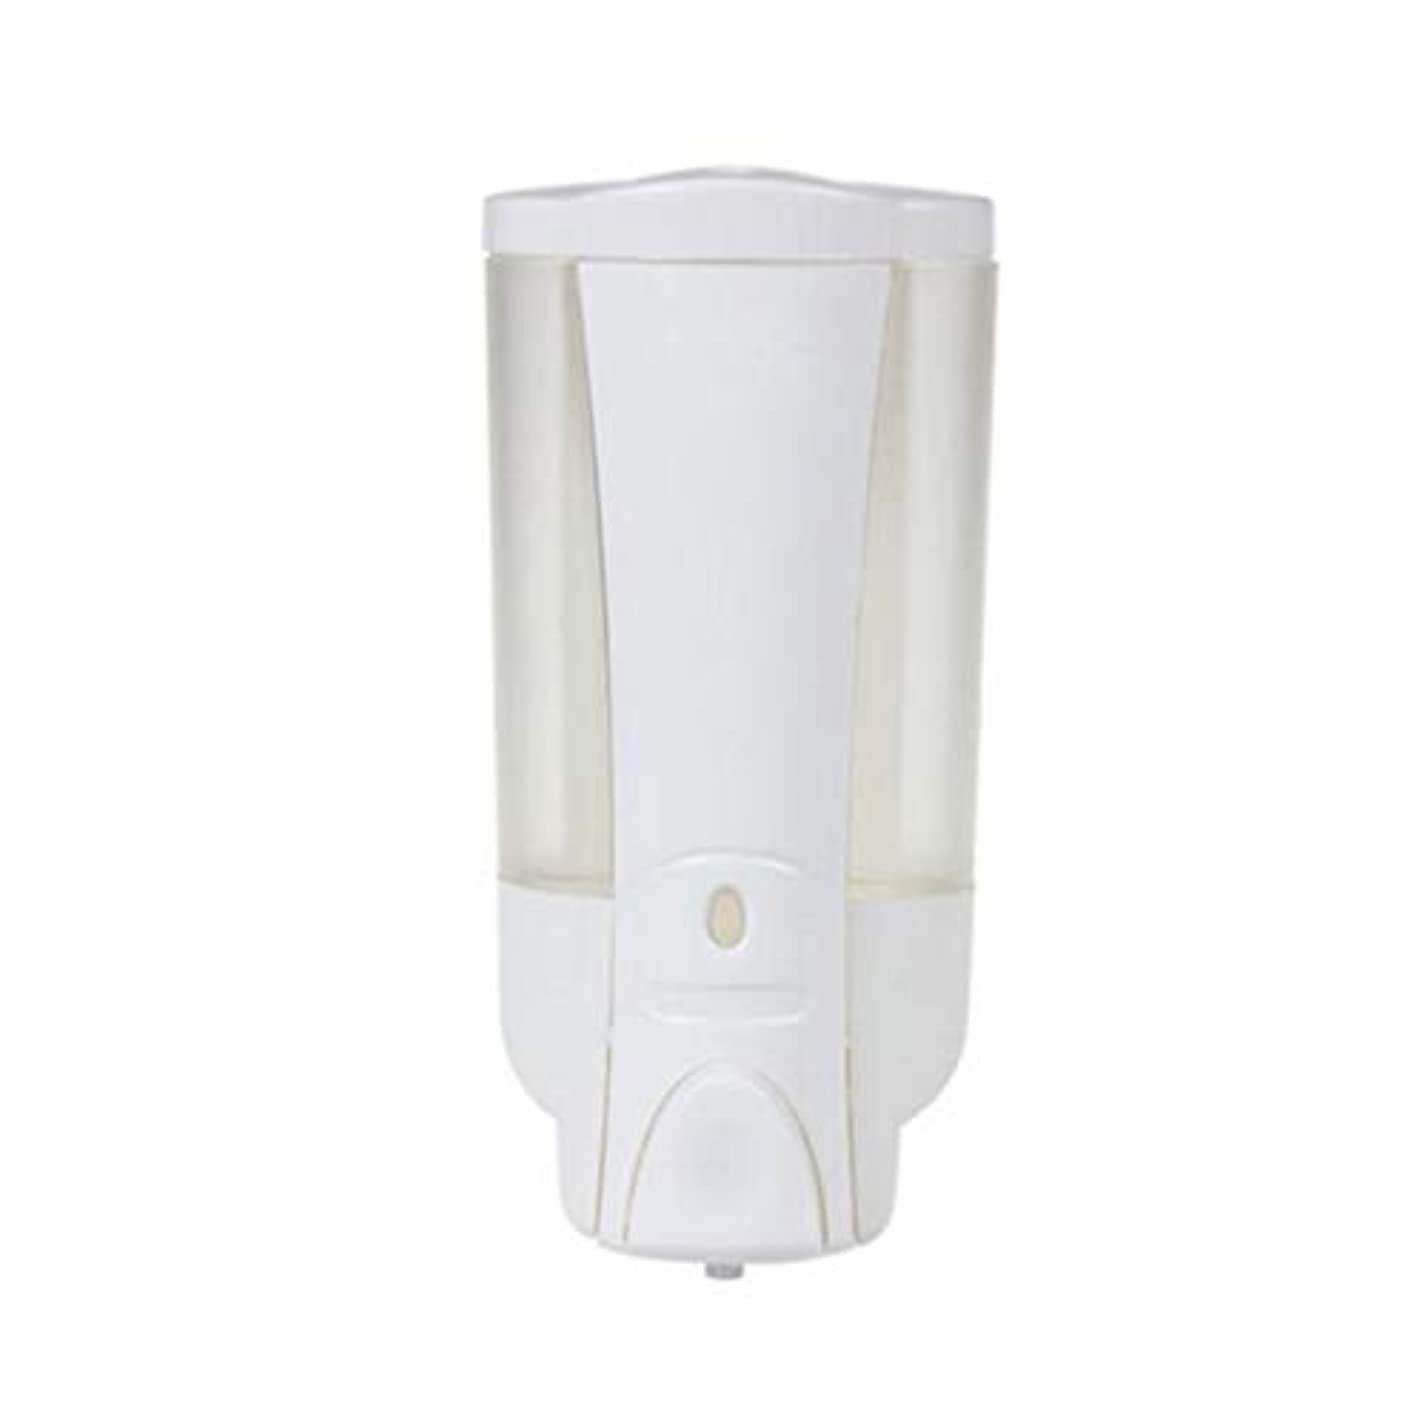 Kylinssh 泡立つ石鹸ディスペンサー450ml容量、石鹸、DIY液体石鹸、皿石鹸、ボディウォッシュなどに使用するための空のプラスチック液体石鹸ポンプボトル